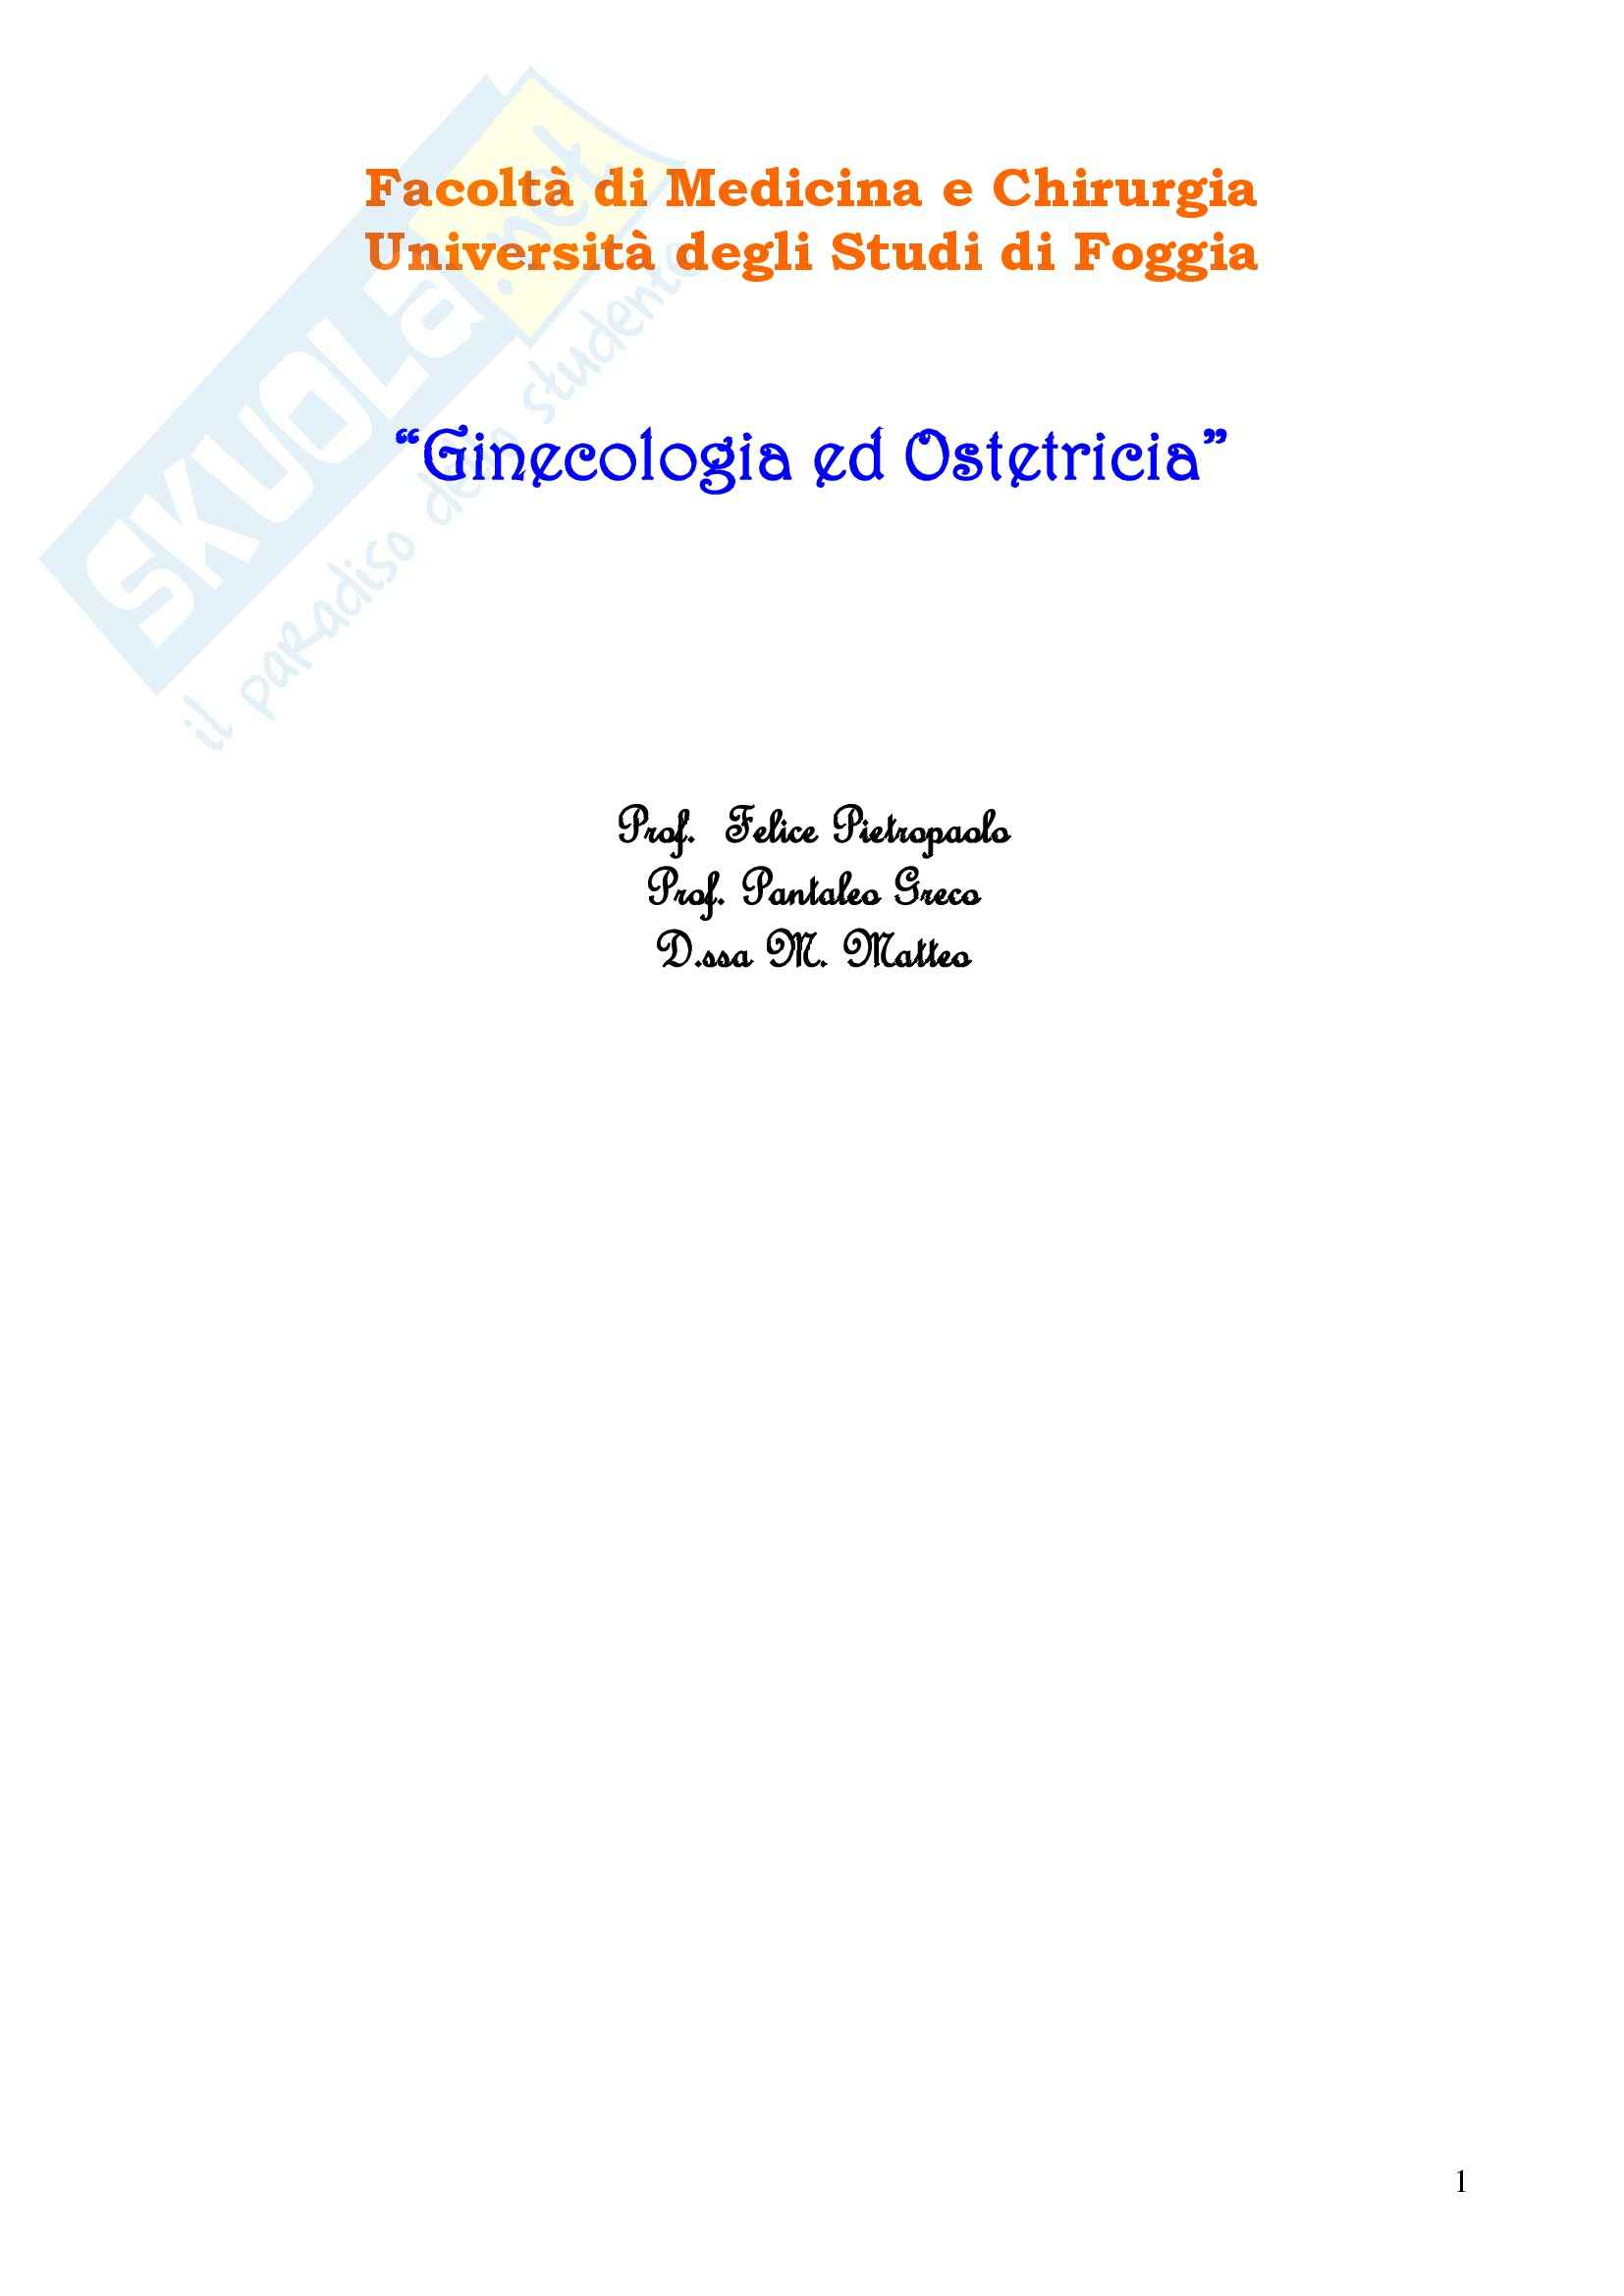 Ginecologia e Ostetricia - Appunti